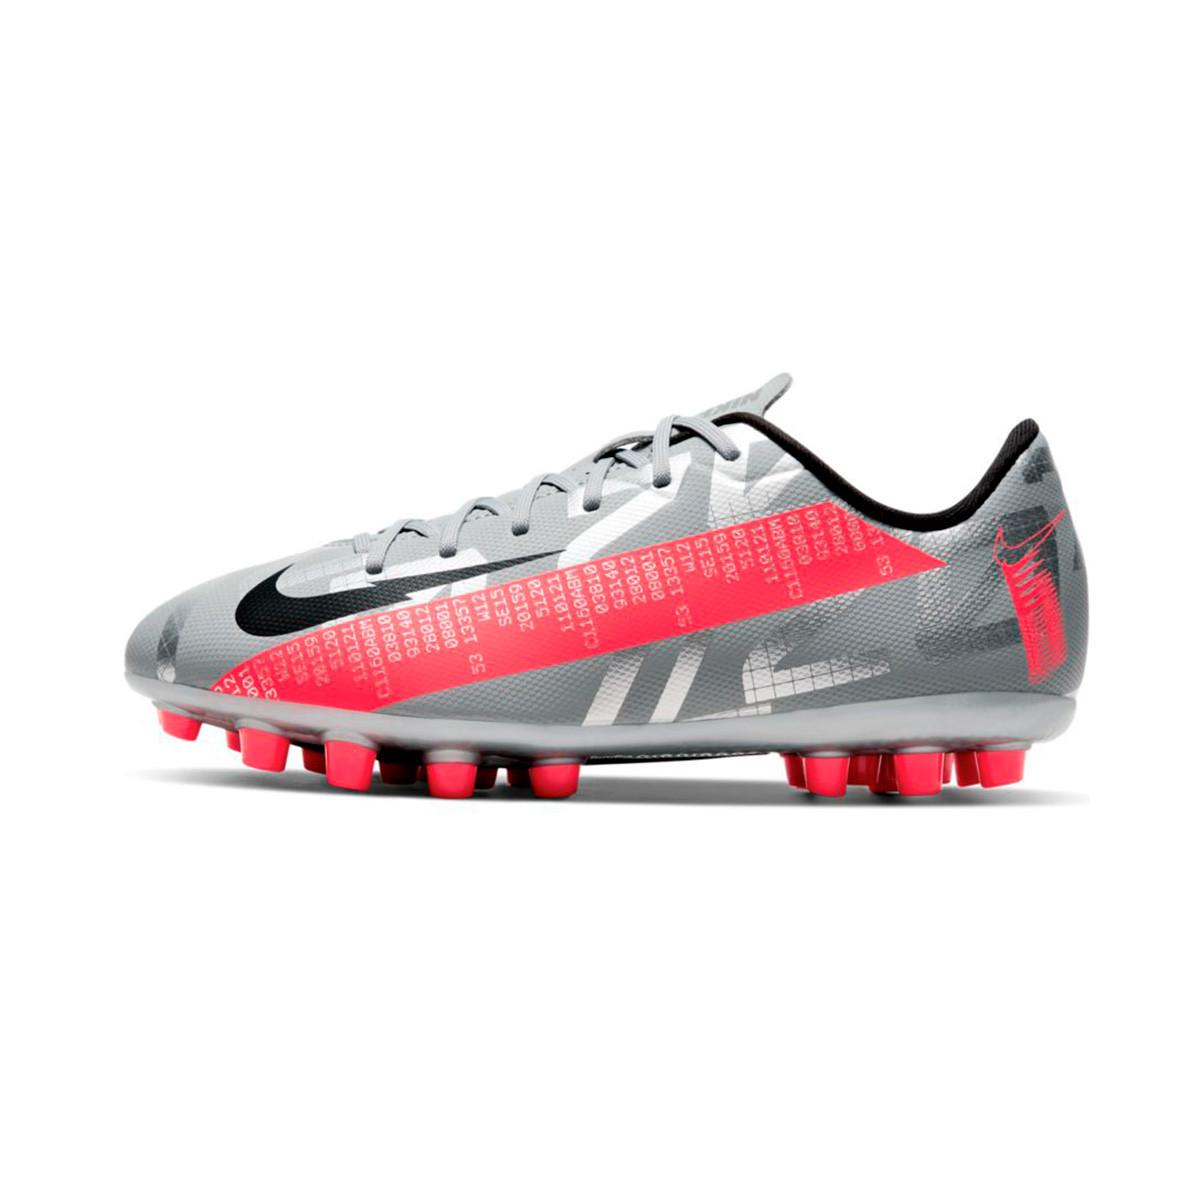 Sneakers Nike Mercurial Vapor Chaussure de football, pelouse